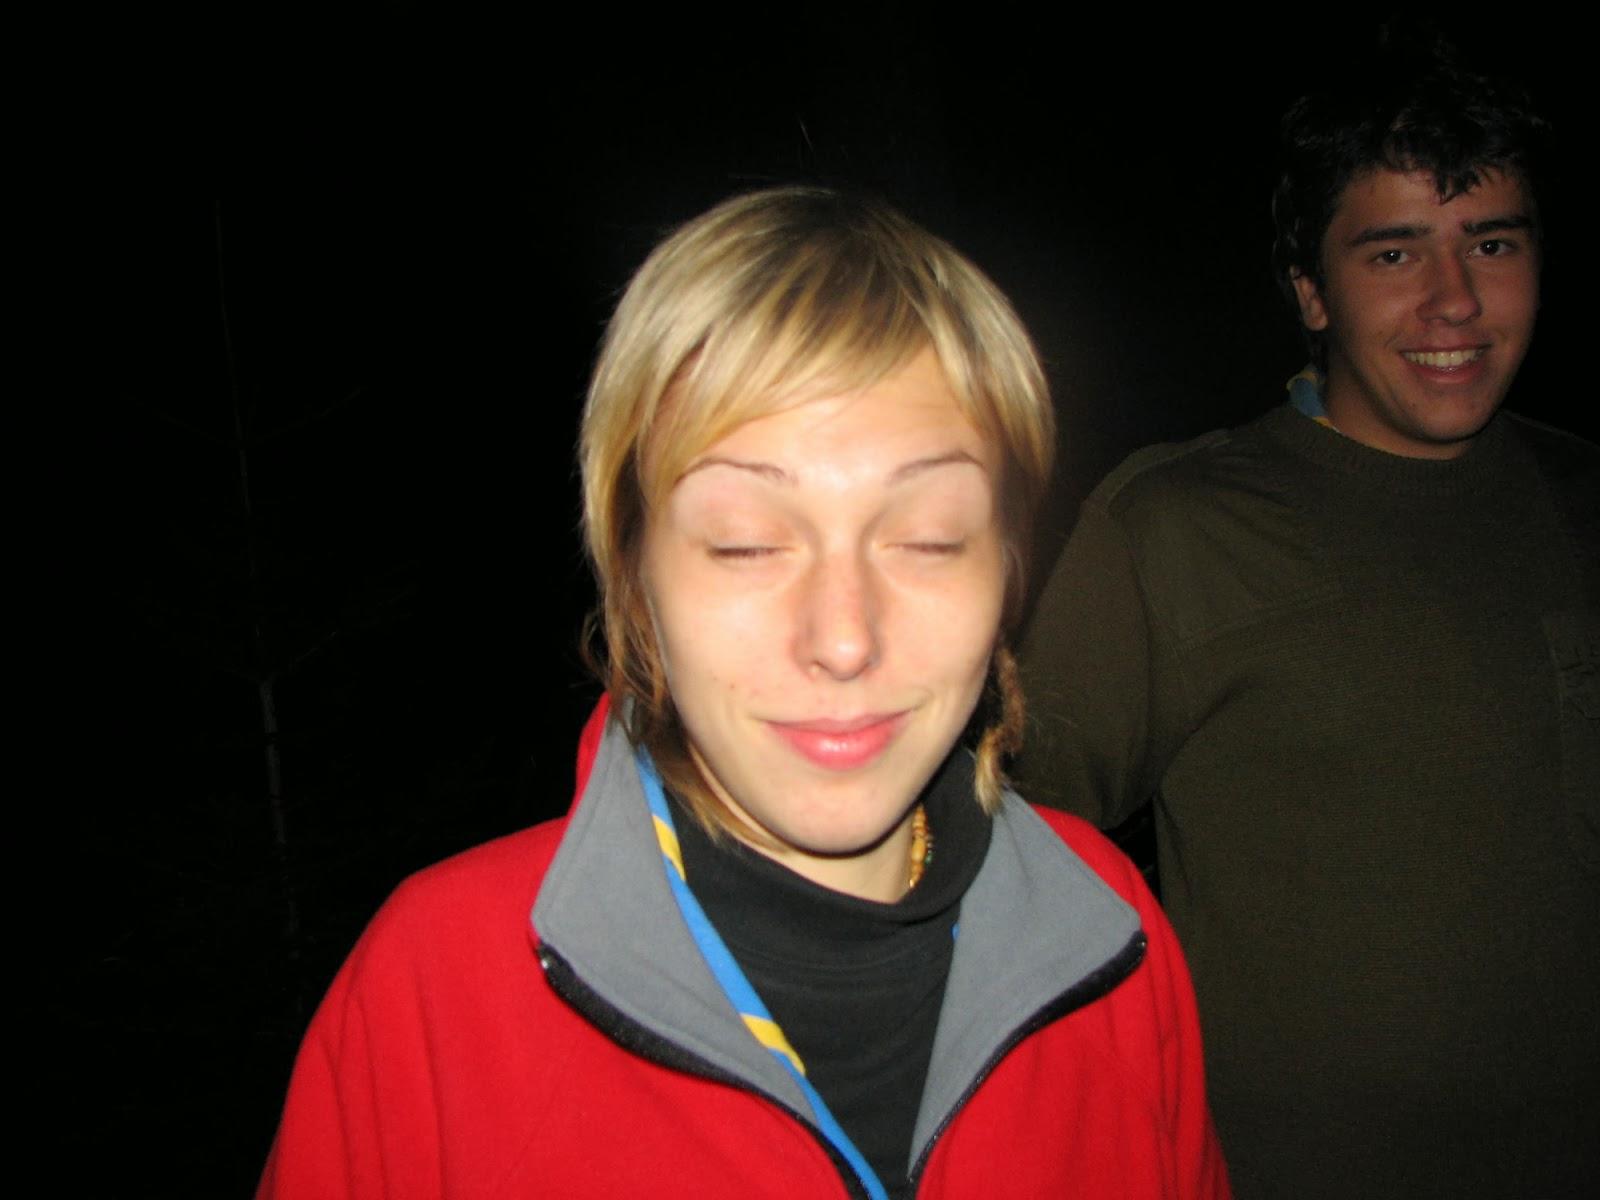 Prehod PP, Ilirska Bistrica 2005 - picture%2B037.jpg